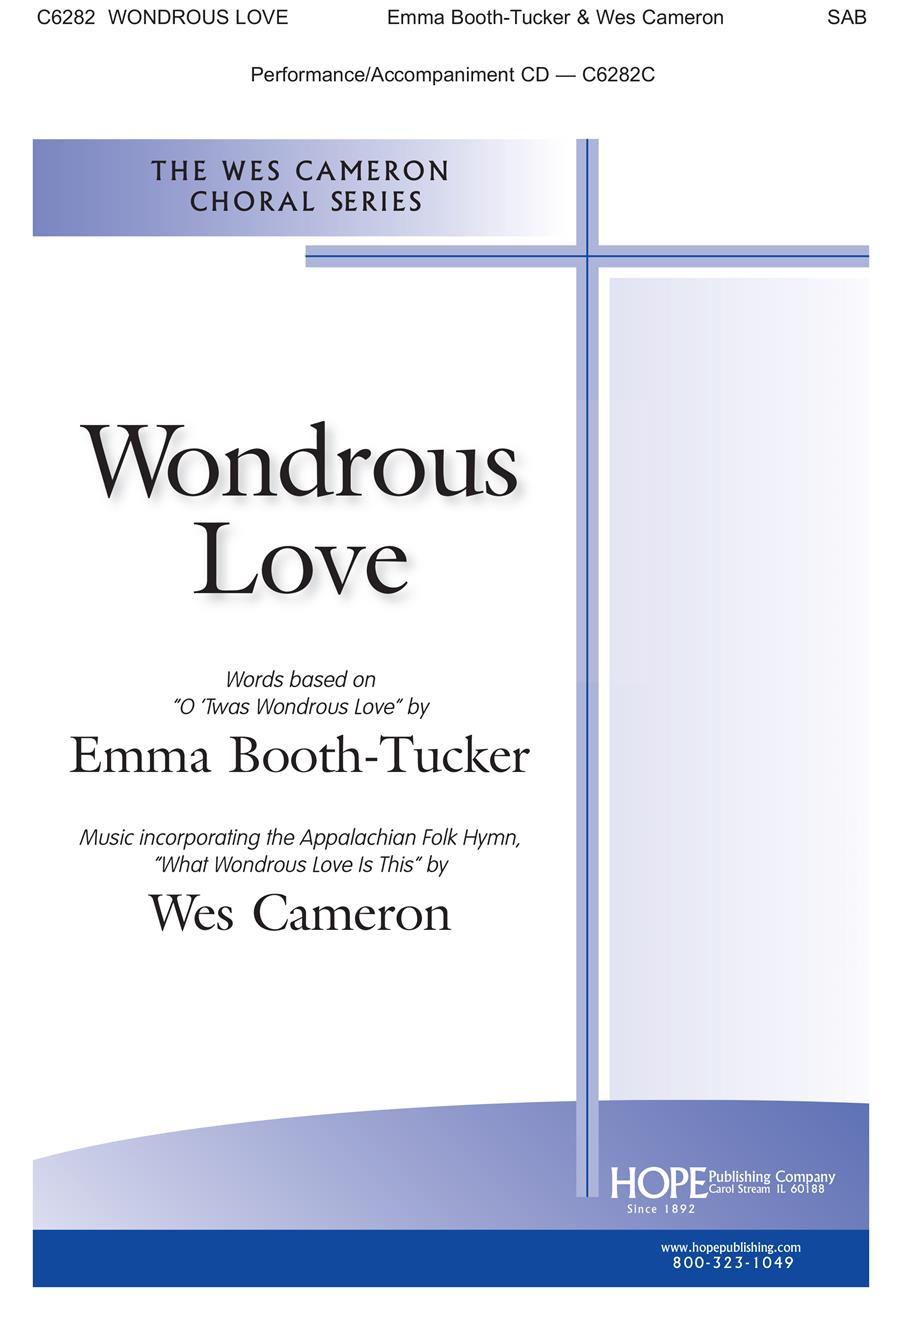 Wondrous Love - SAB Cover Image